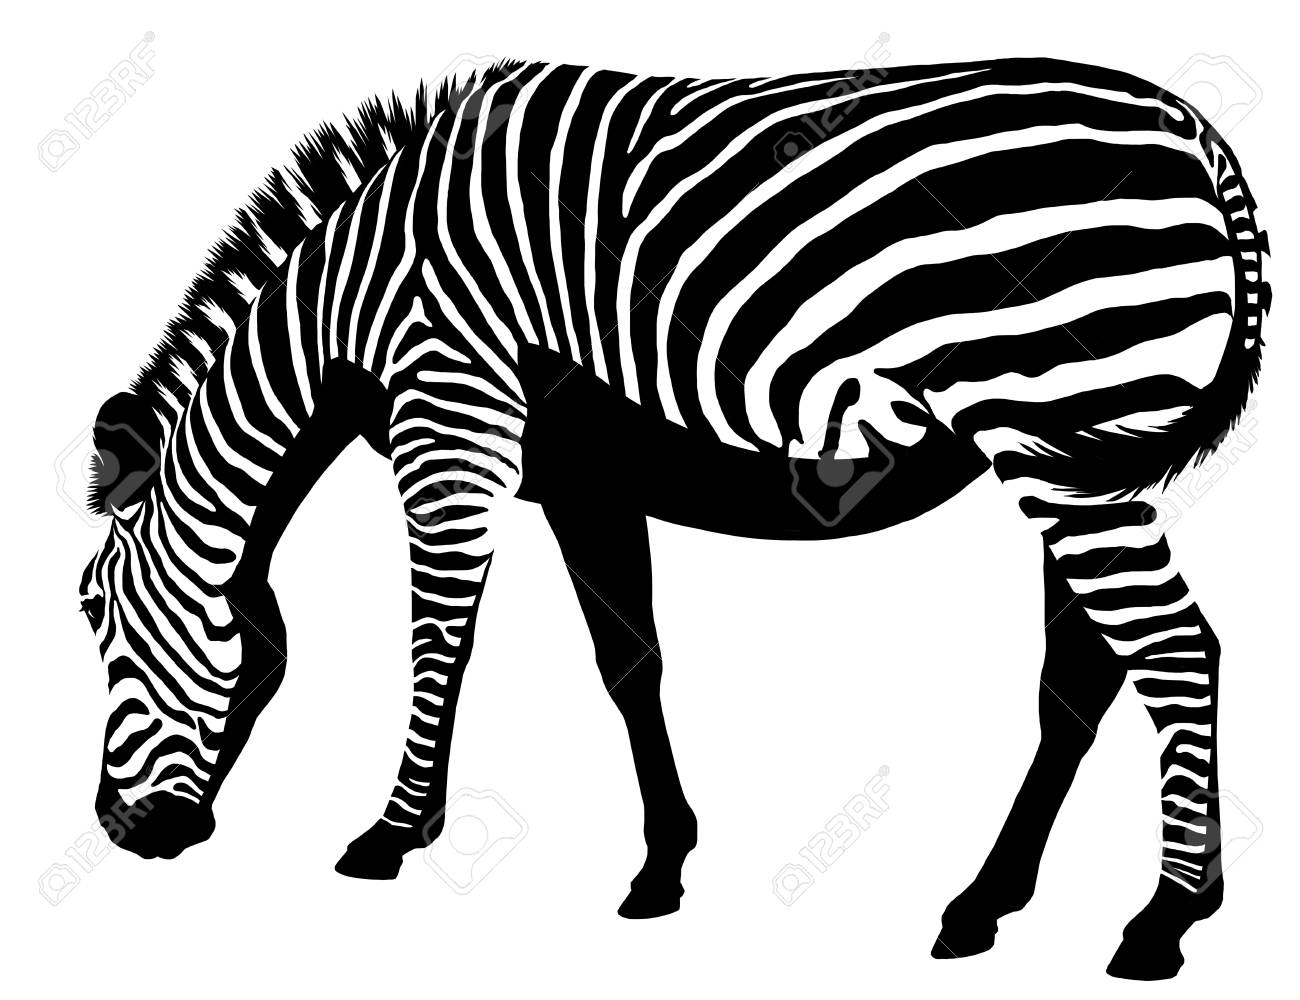 Großartig Zebra Etikettenvorlagen Galerie - Entry Level Resume ...